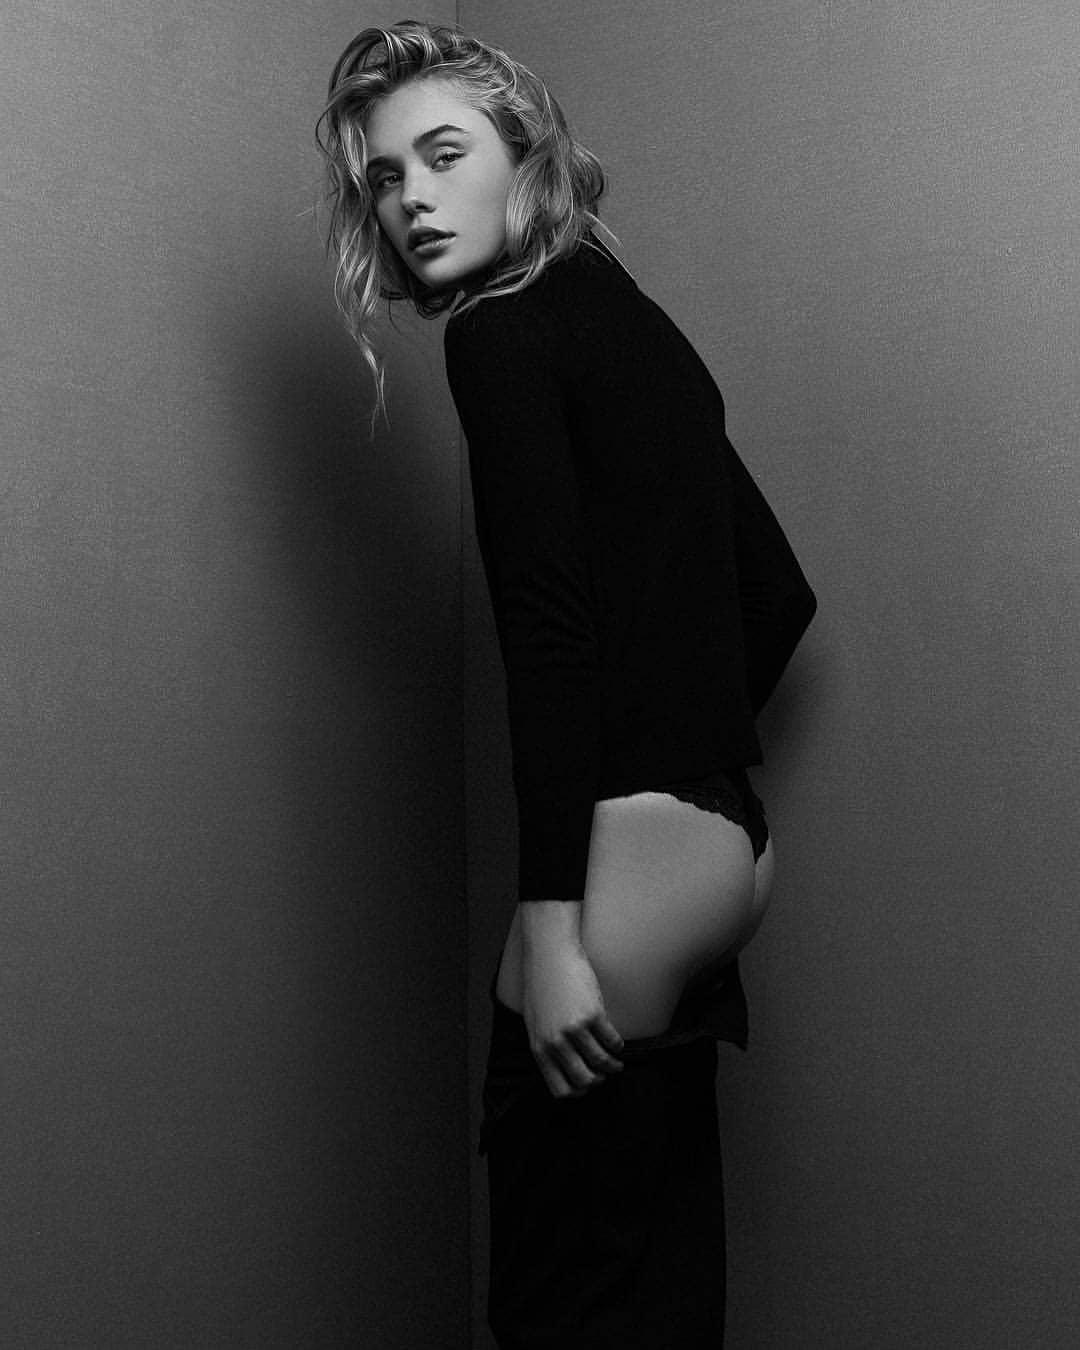 Brooke Perry by Nick Suarez